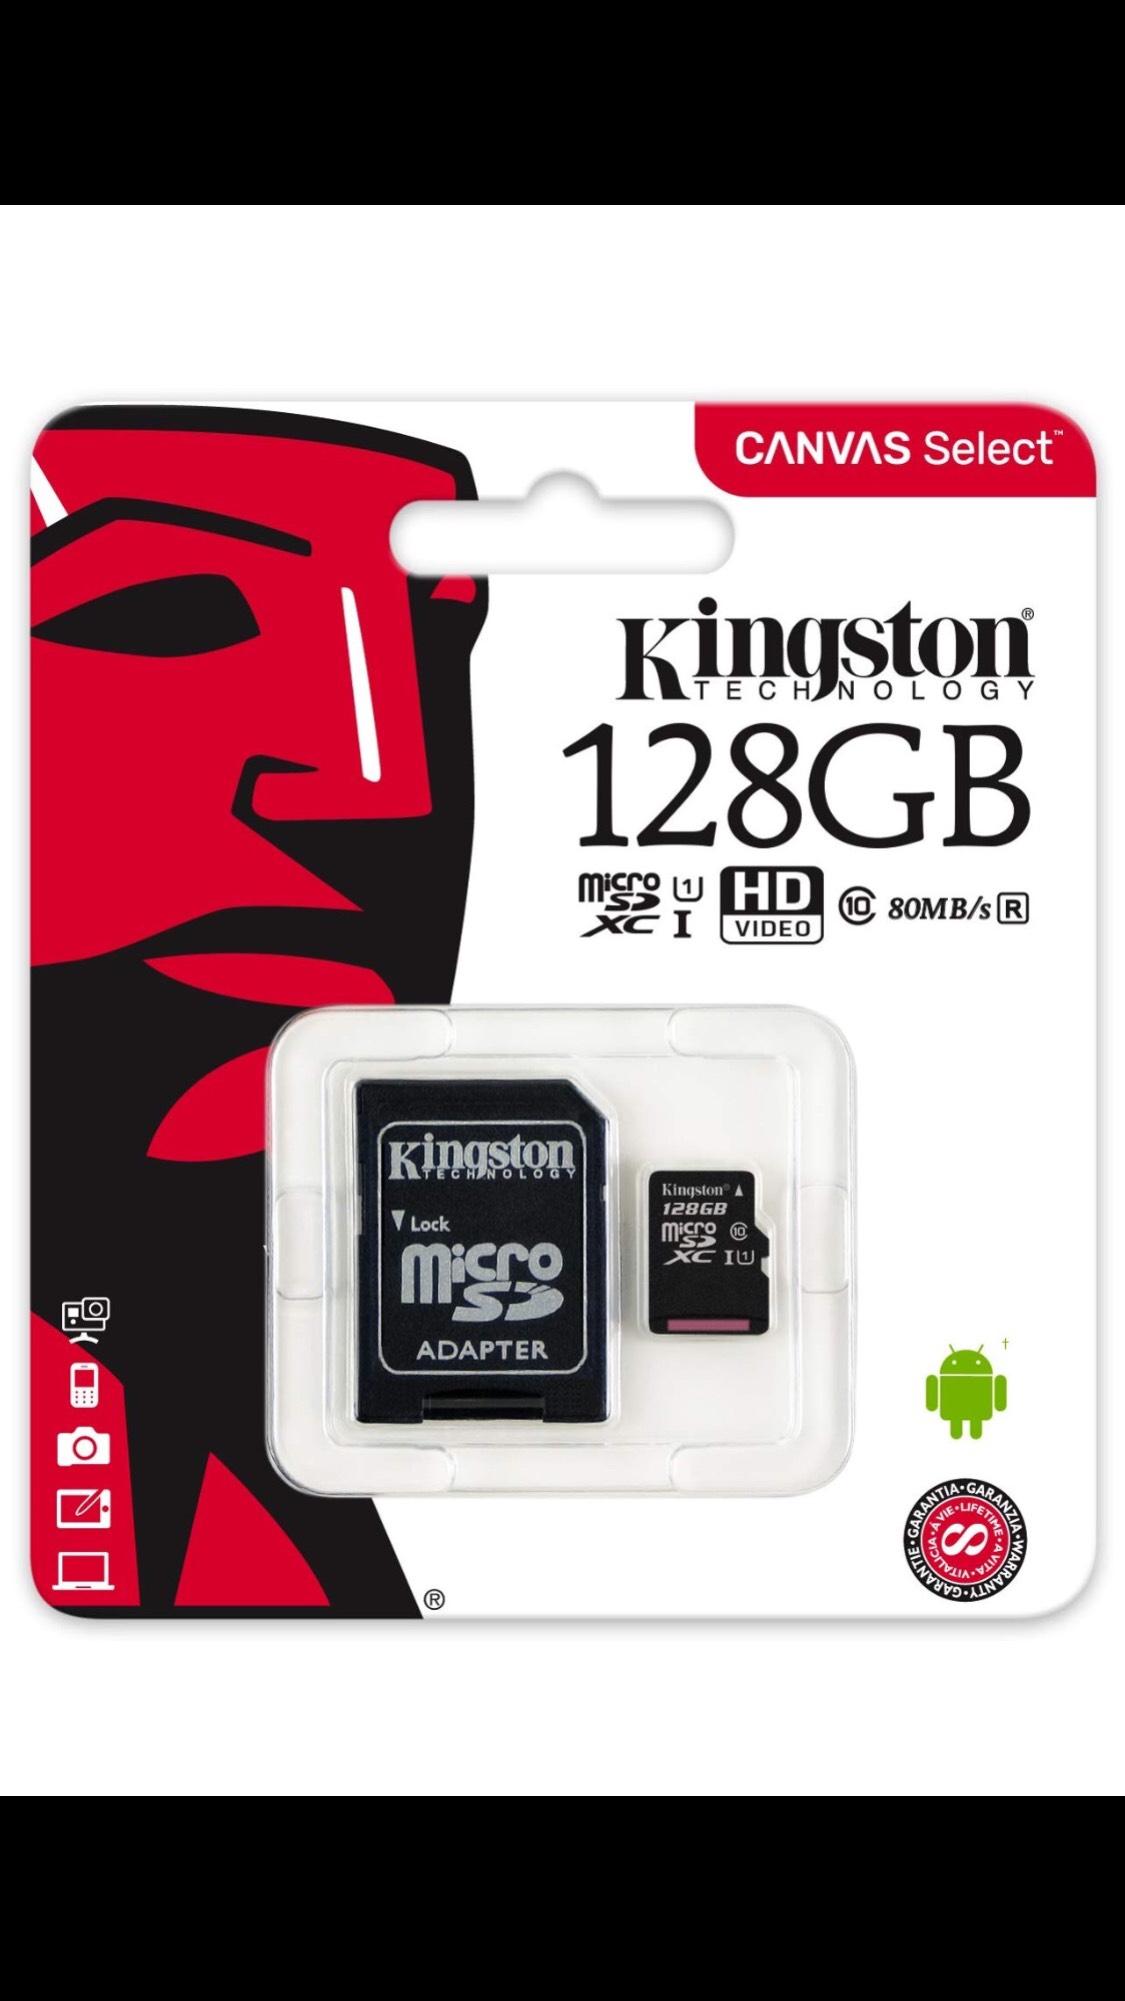 Kingston SDCS/128GB SDCS 128 GB microSD Canvas Class10 UHS-I Memory Card £20.35 @ Amazon